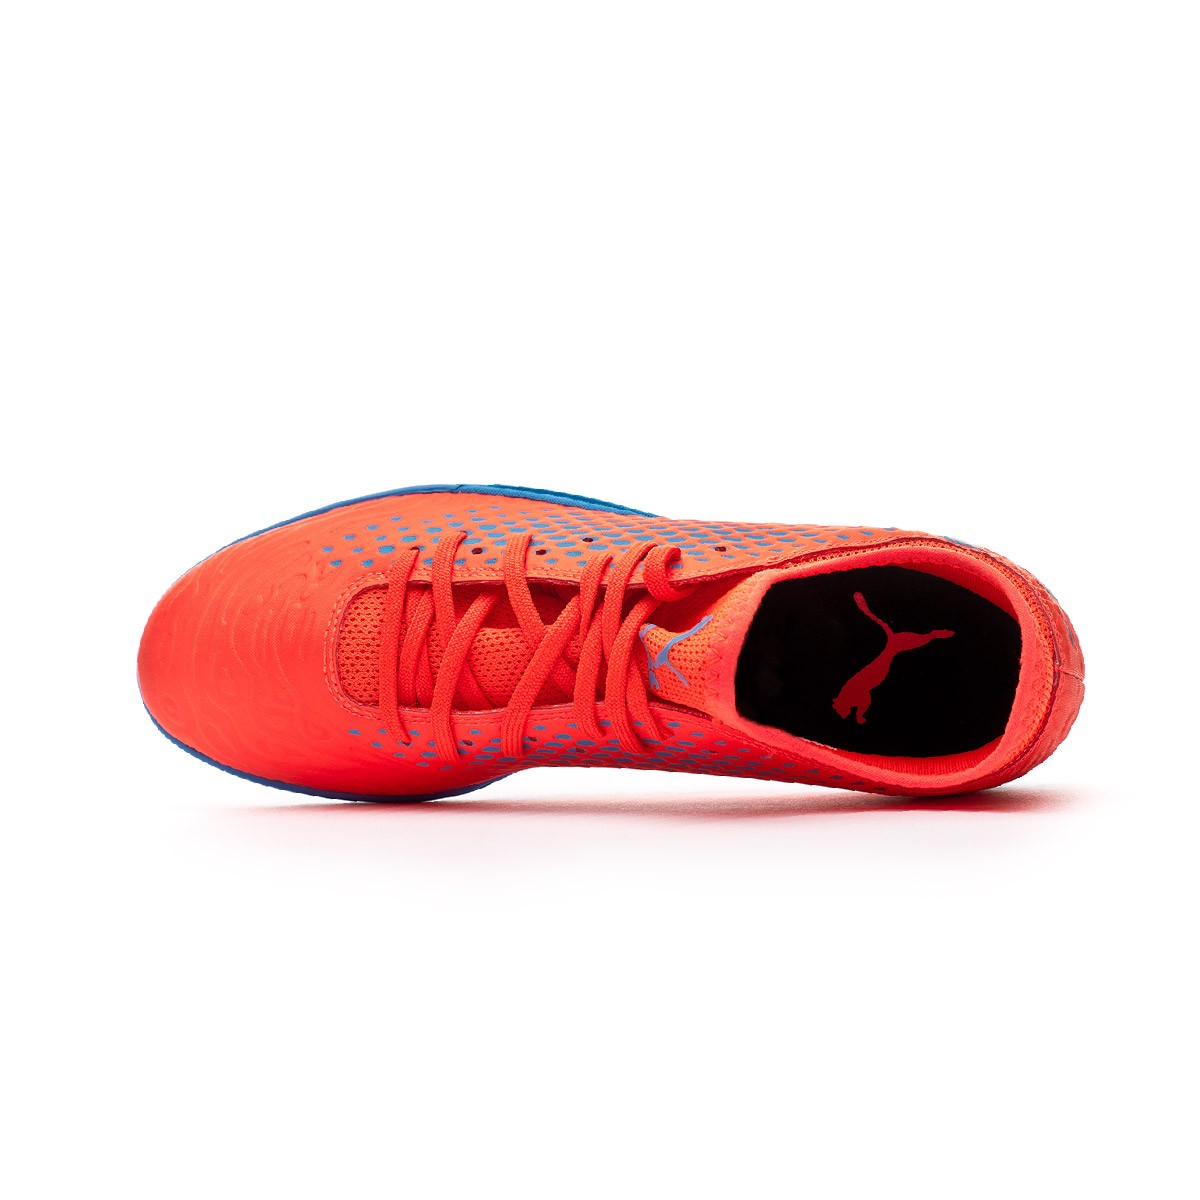 Chaussure de futsal Puma Future 19.4 IT